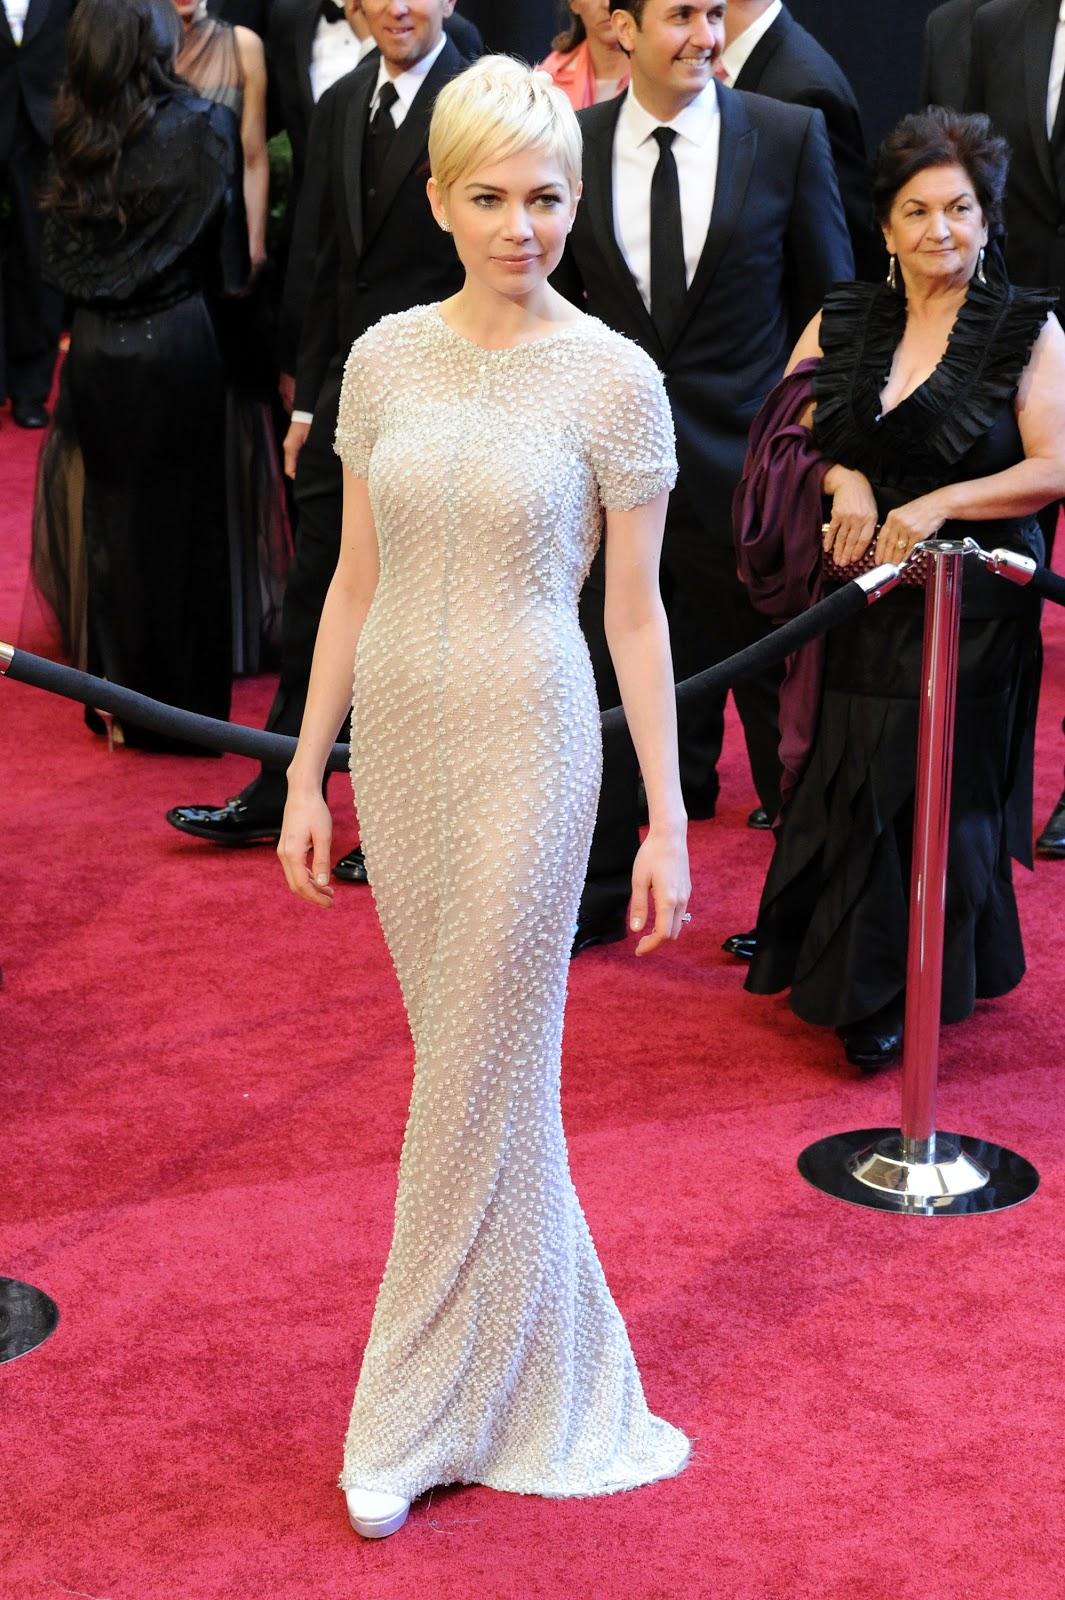 http://4.bp.blogspot.com/-nmgzaiGtMJE/Tv9fCSMeNAI/AAAAAAAAOLQ/u2ldNMNYmcs/s1600/10418_Tikipeter_Michelle_Williams_Oscars_1_066_123_136lo.jpg